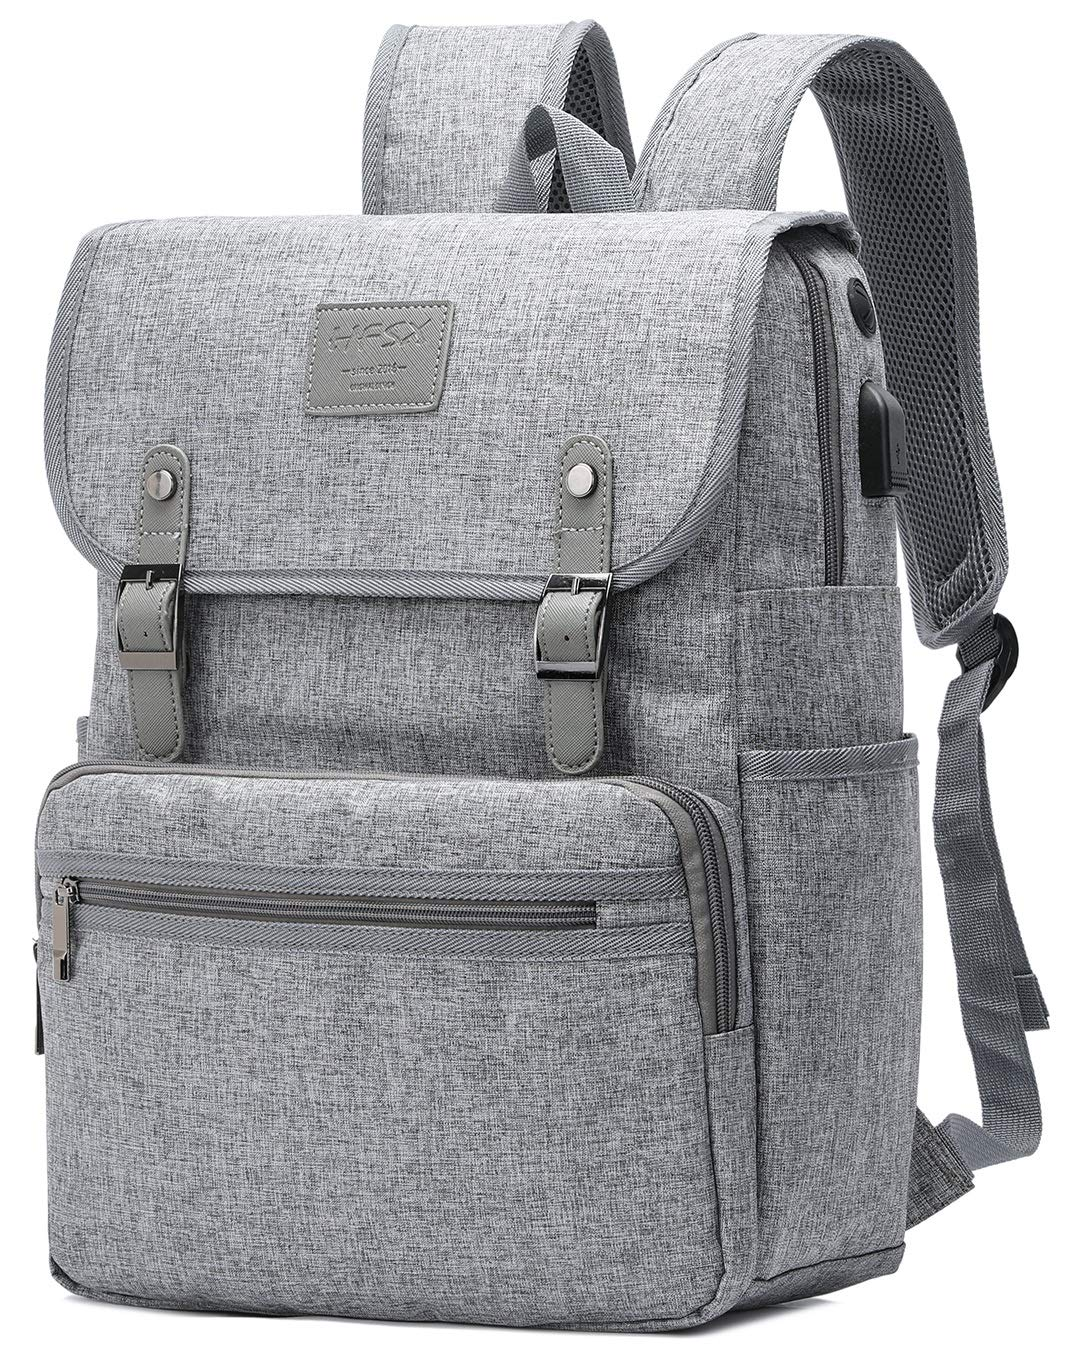 HFSX Backpack Bookbags Laptop Backpack for Women Men Vintage Backpack College Backpack Travel Bookbag Laptop Bookbags with USB Charging Port Gray Backpacks Fits 15 inch Notebook